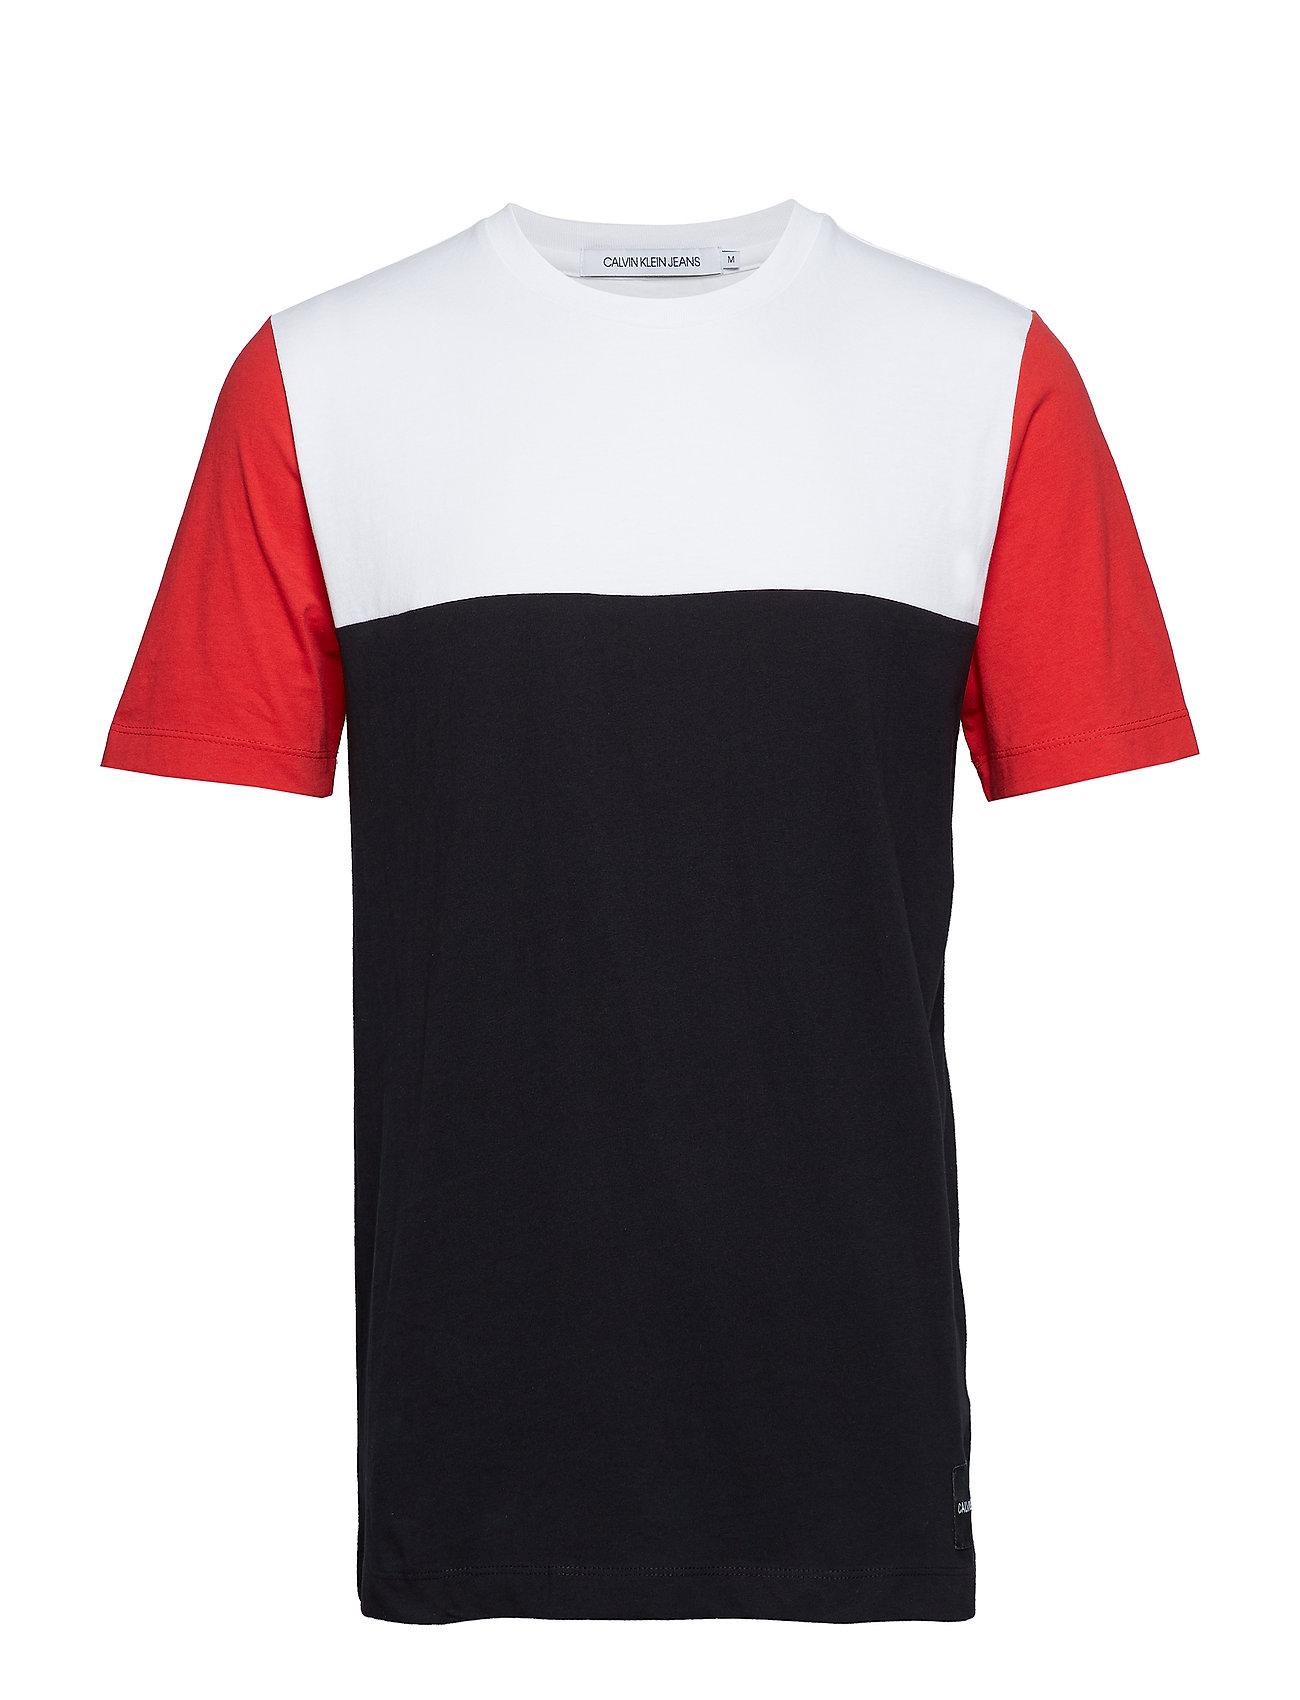 Reg redCalvin Jeans Color White Klein Fck Black bright Blocking Fc35uKJTl1